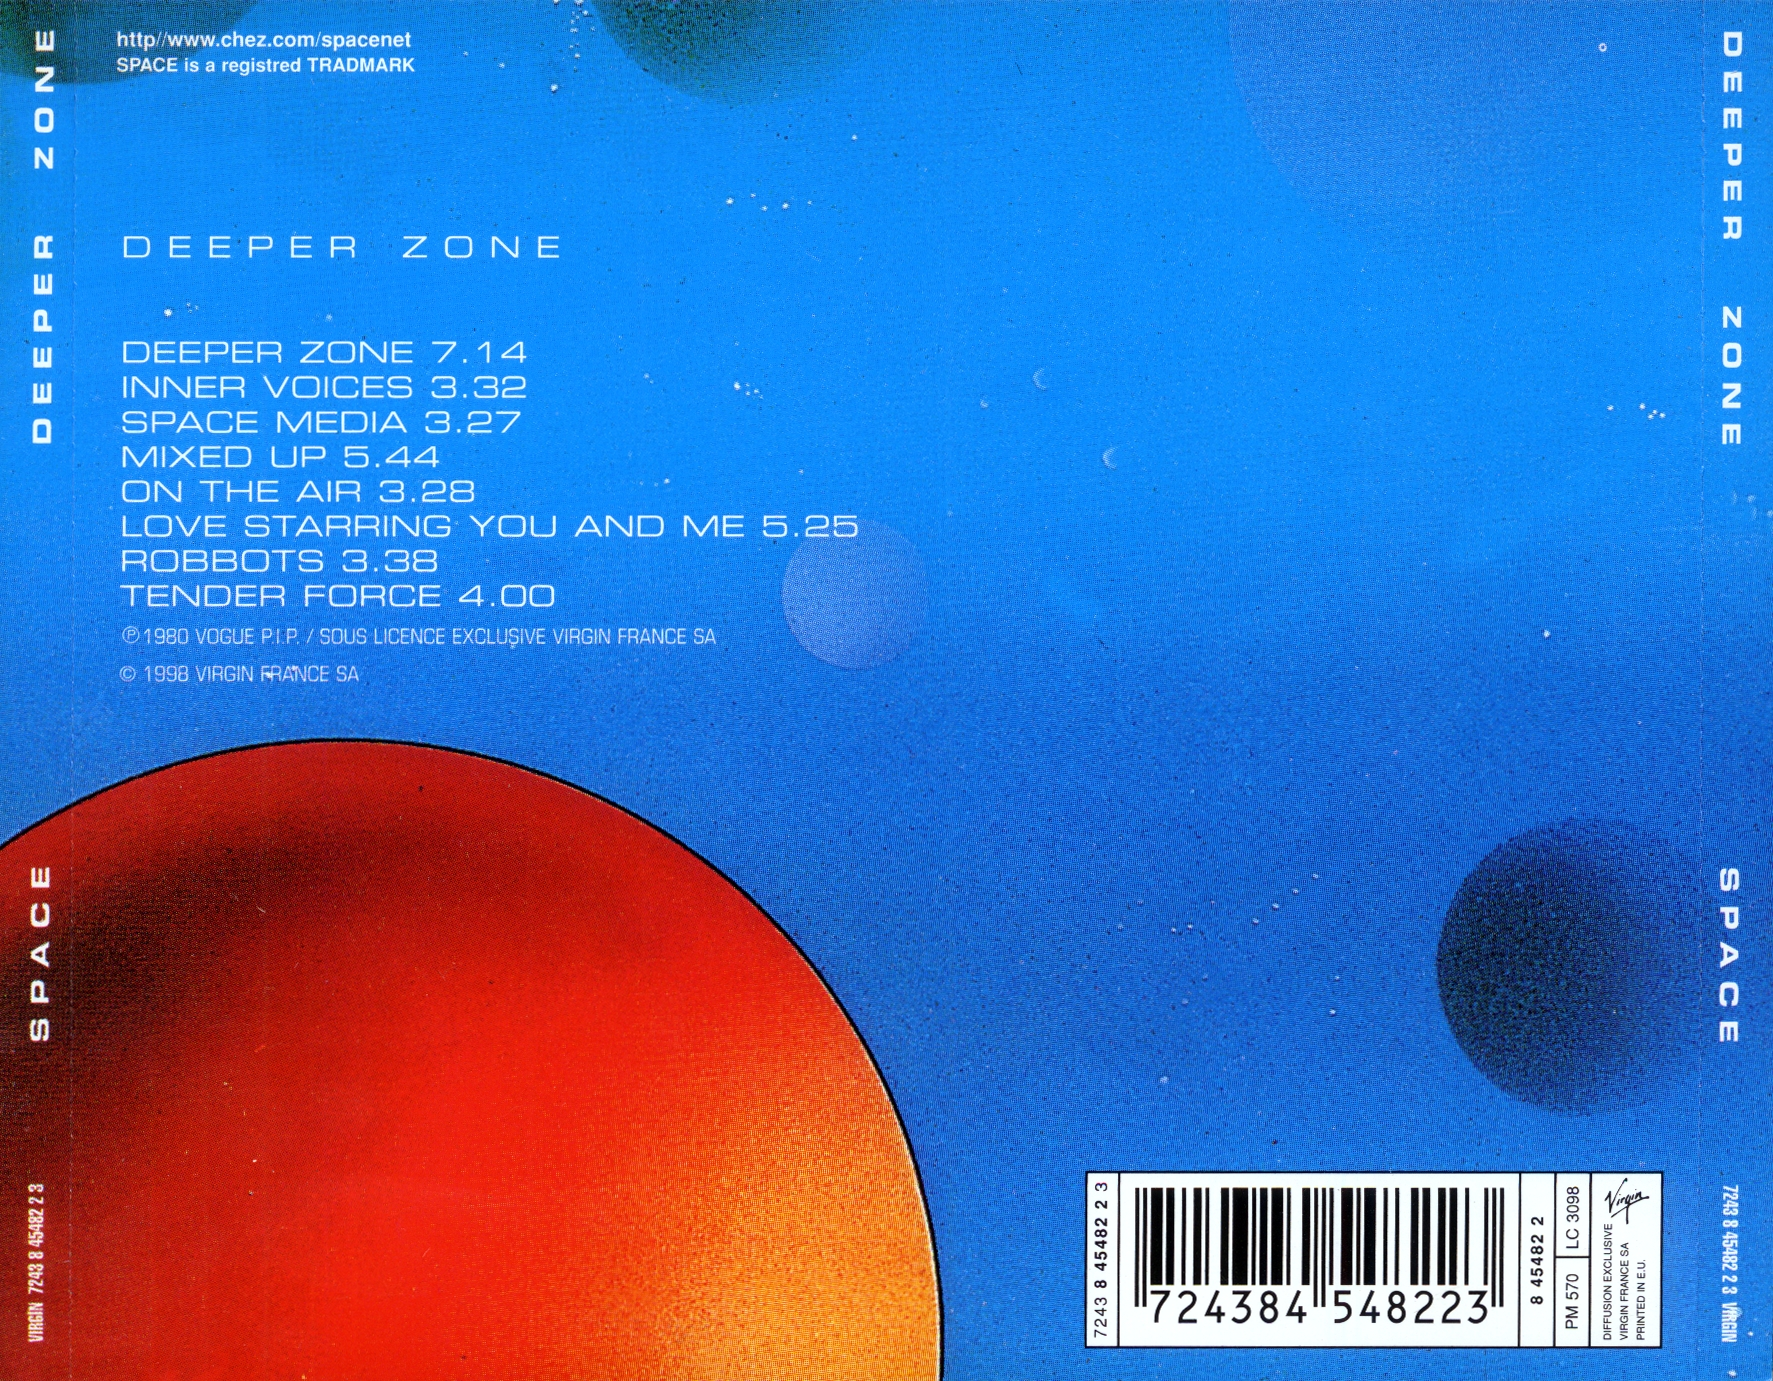 Space deeper zone (virgin france 1998) 1980 lossless все тут.